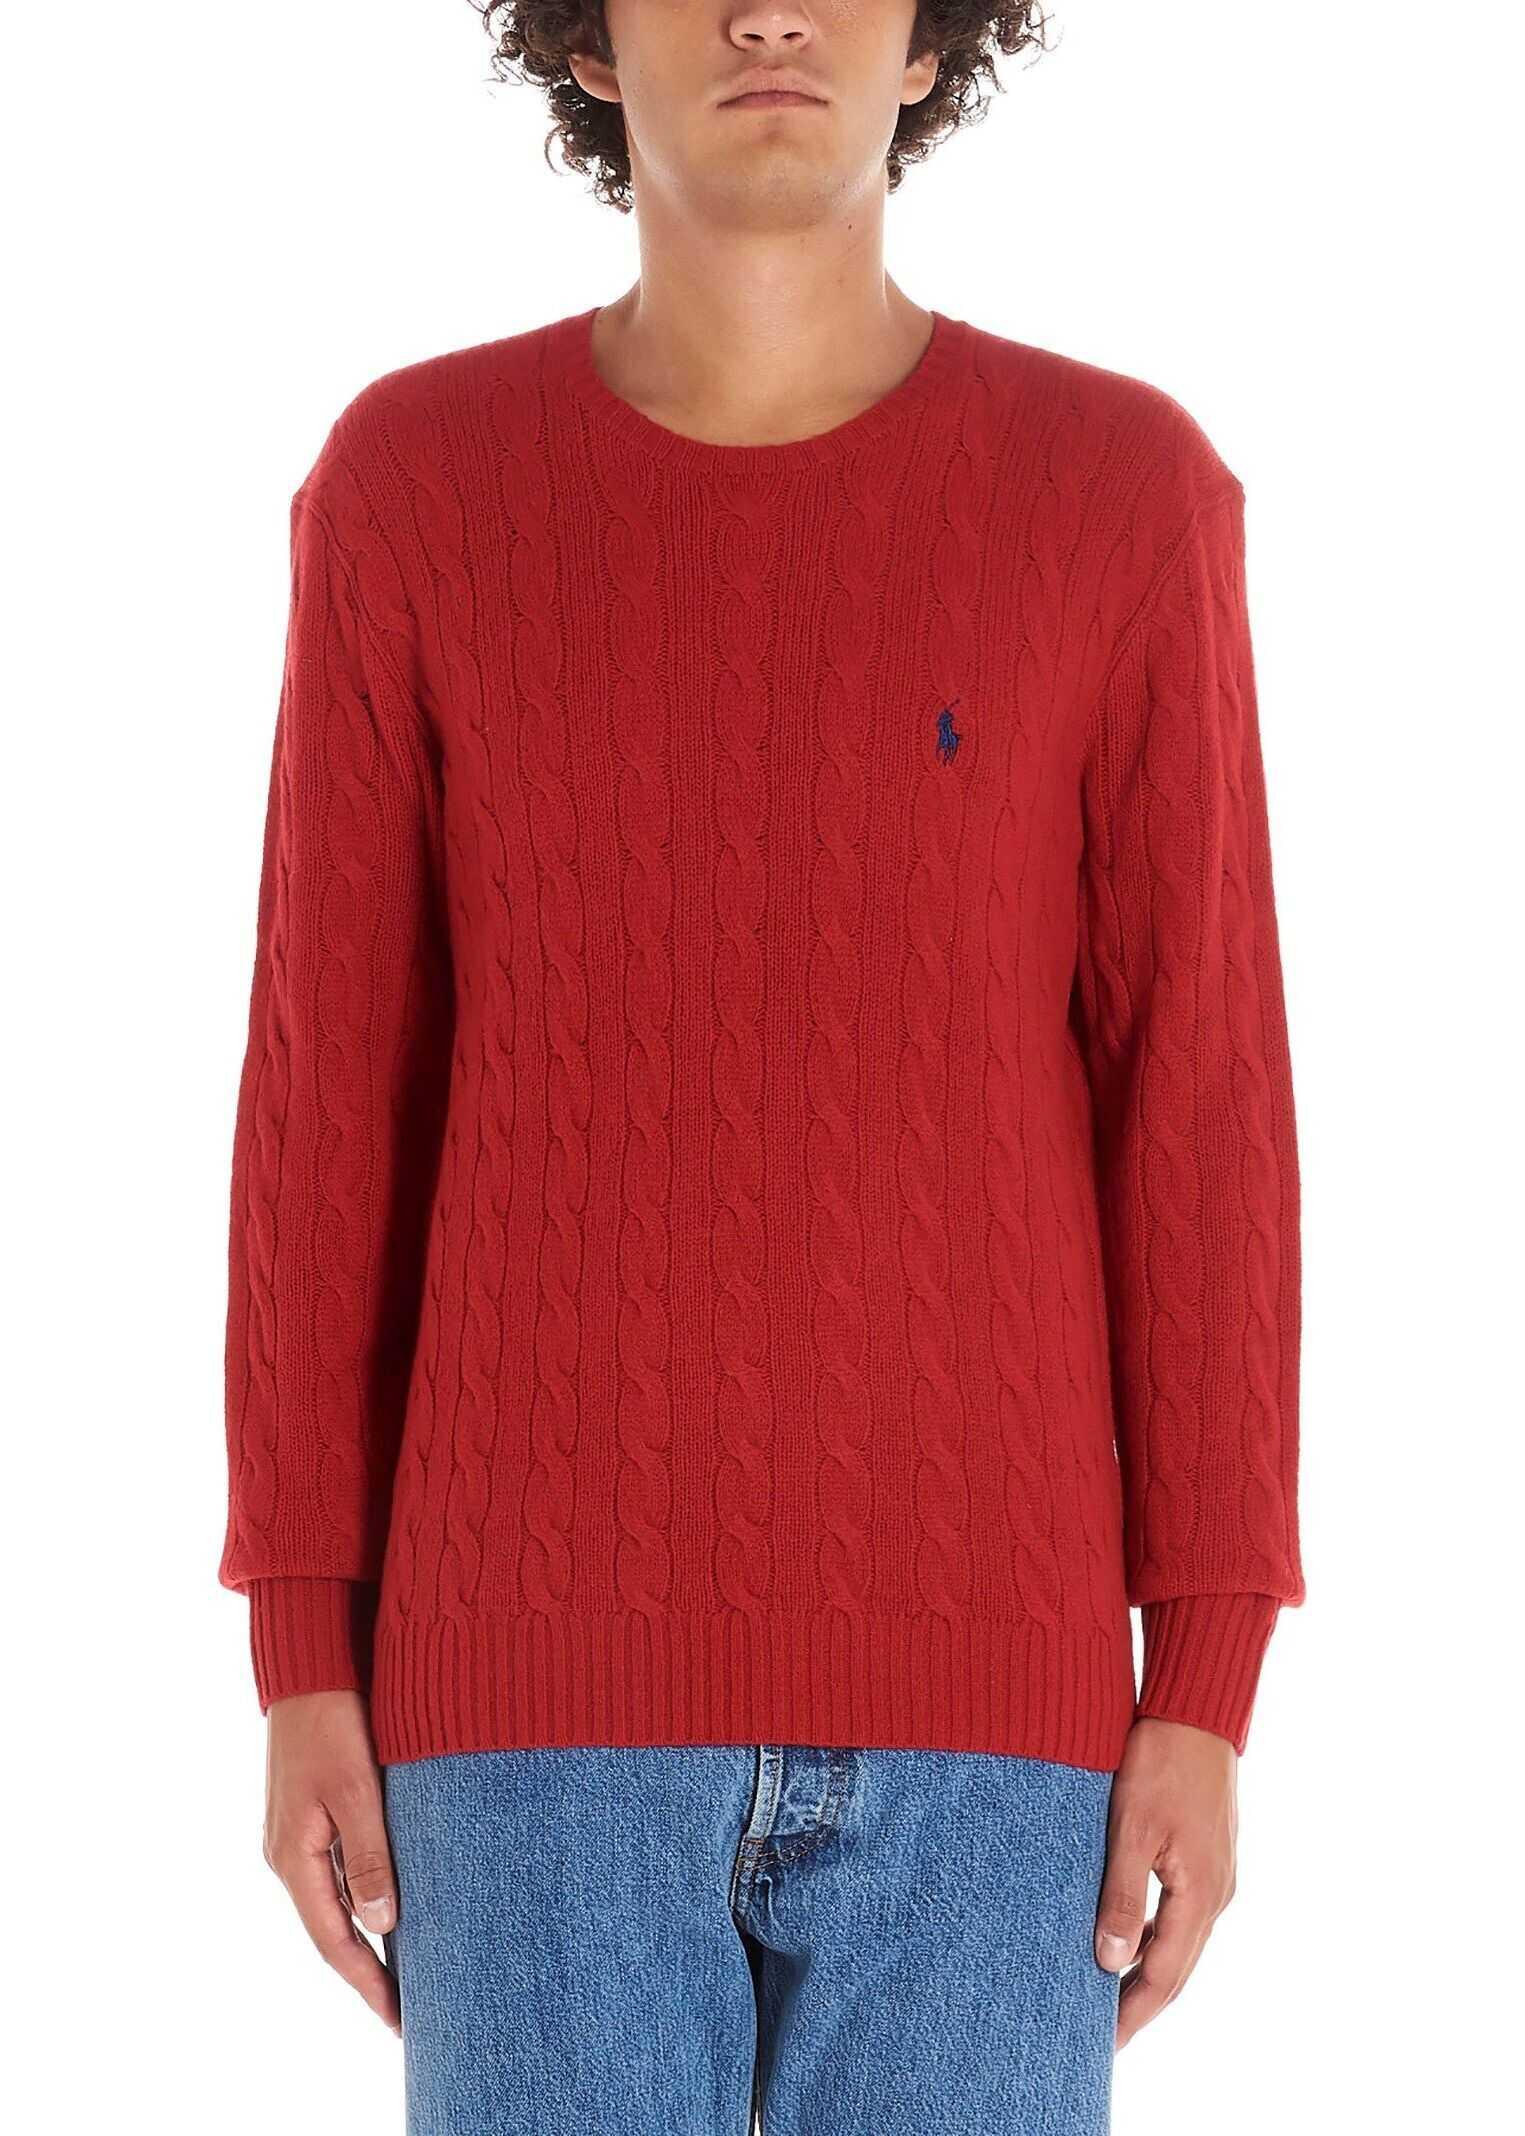 Ralph Lauren Wool Sweater RED